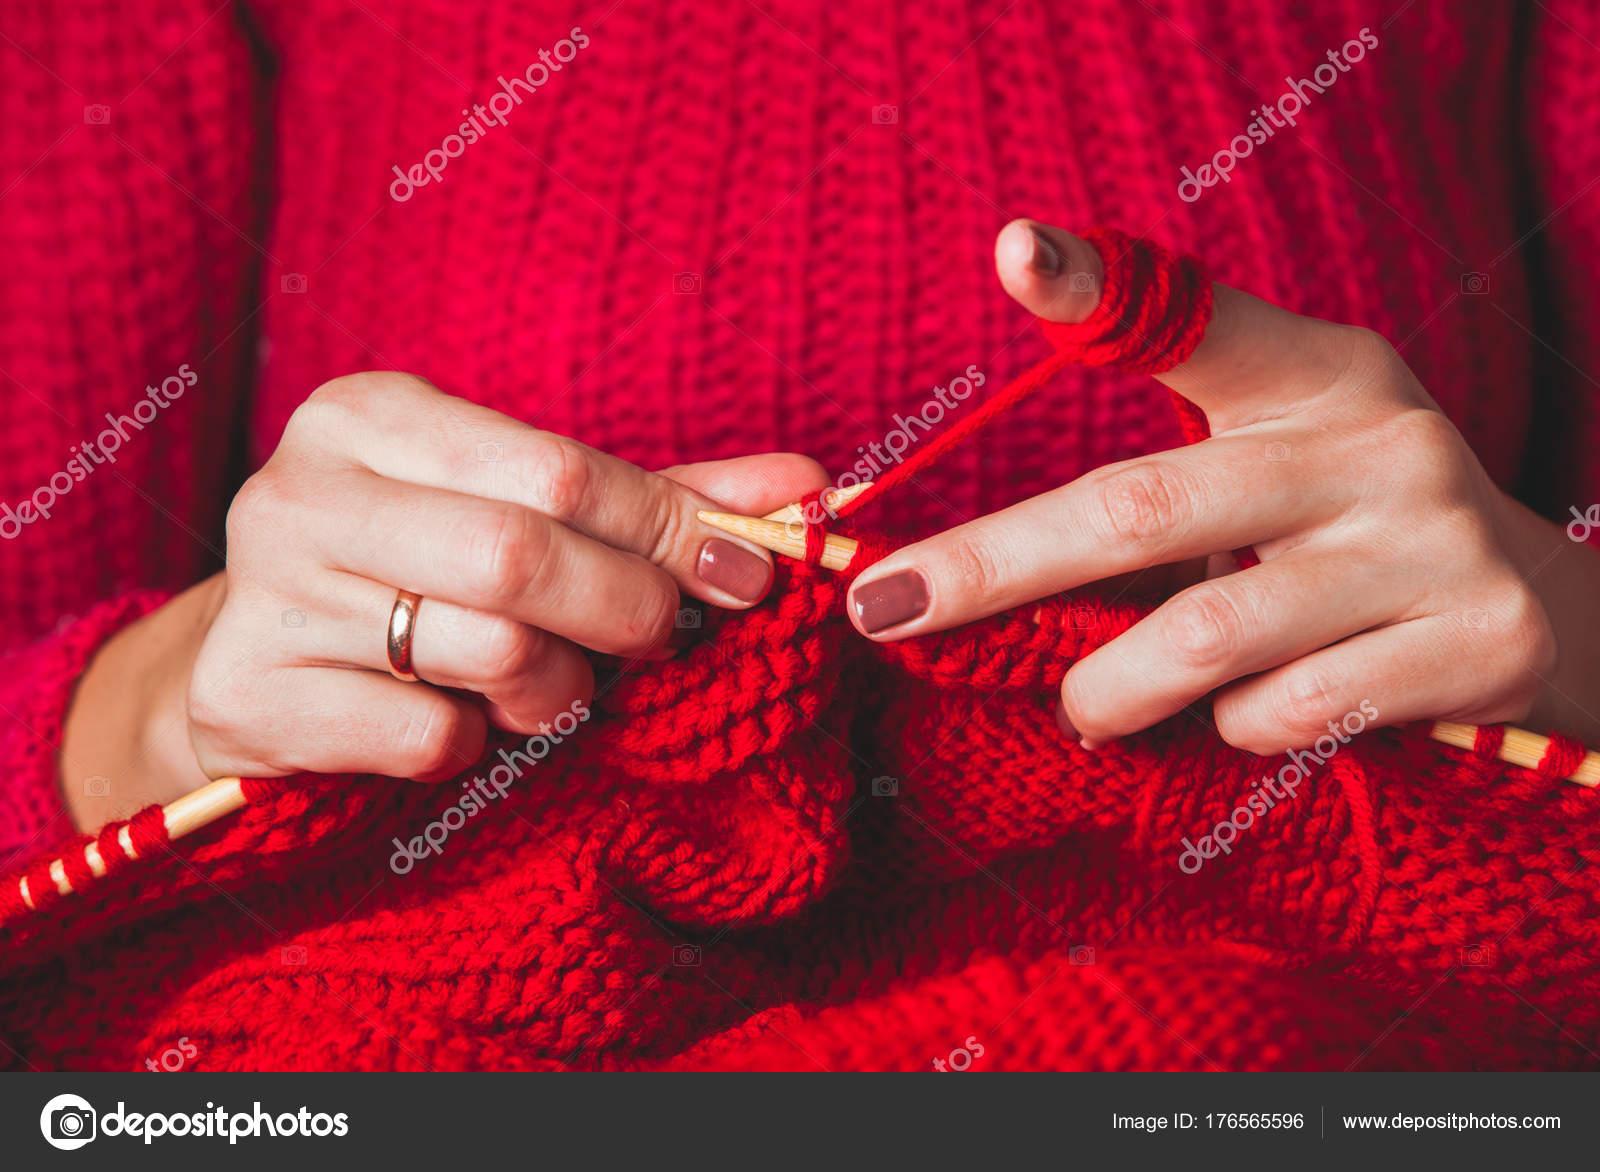 93cd99124c81 Χέρια Γυναικεία πλεκτά πουλόβερ — Φωτογραφία Αρχείου © oksixx  176565596